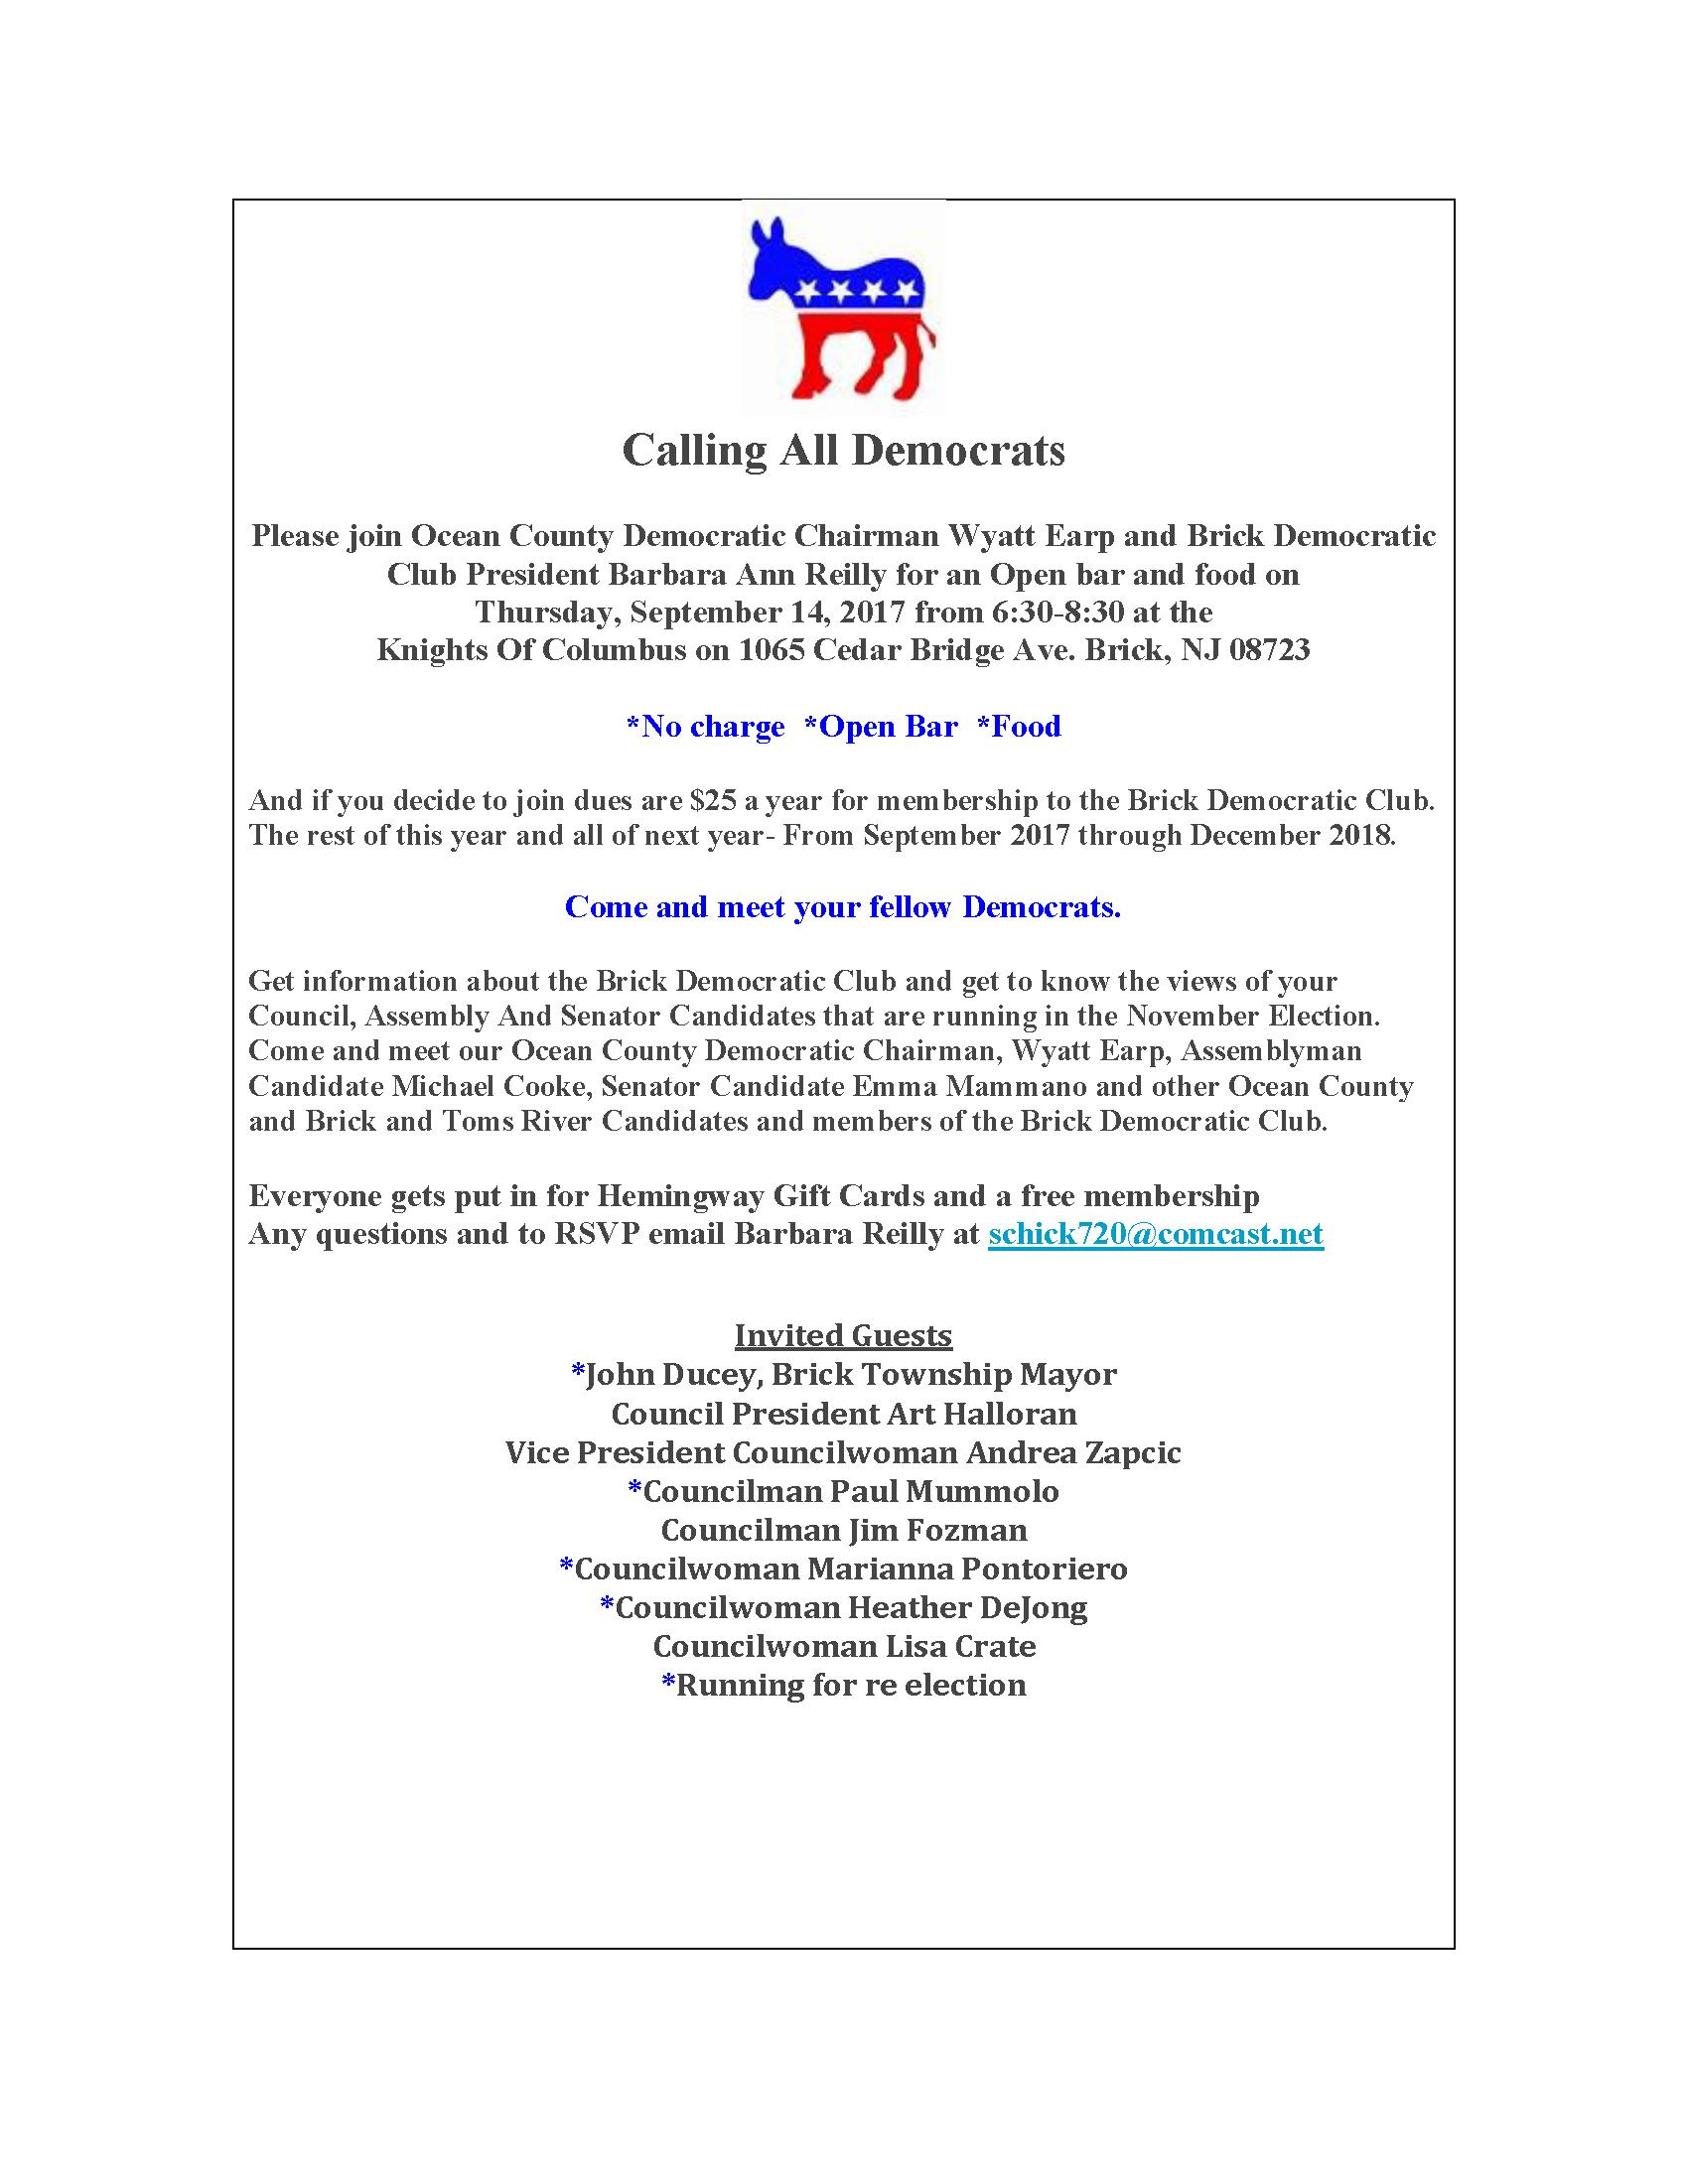 Democratic_Membership_Drive_Page_1.png